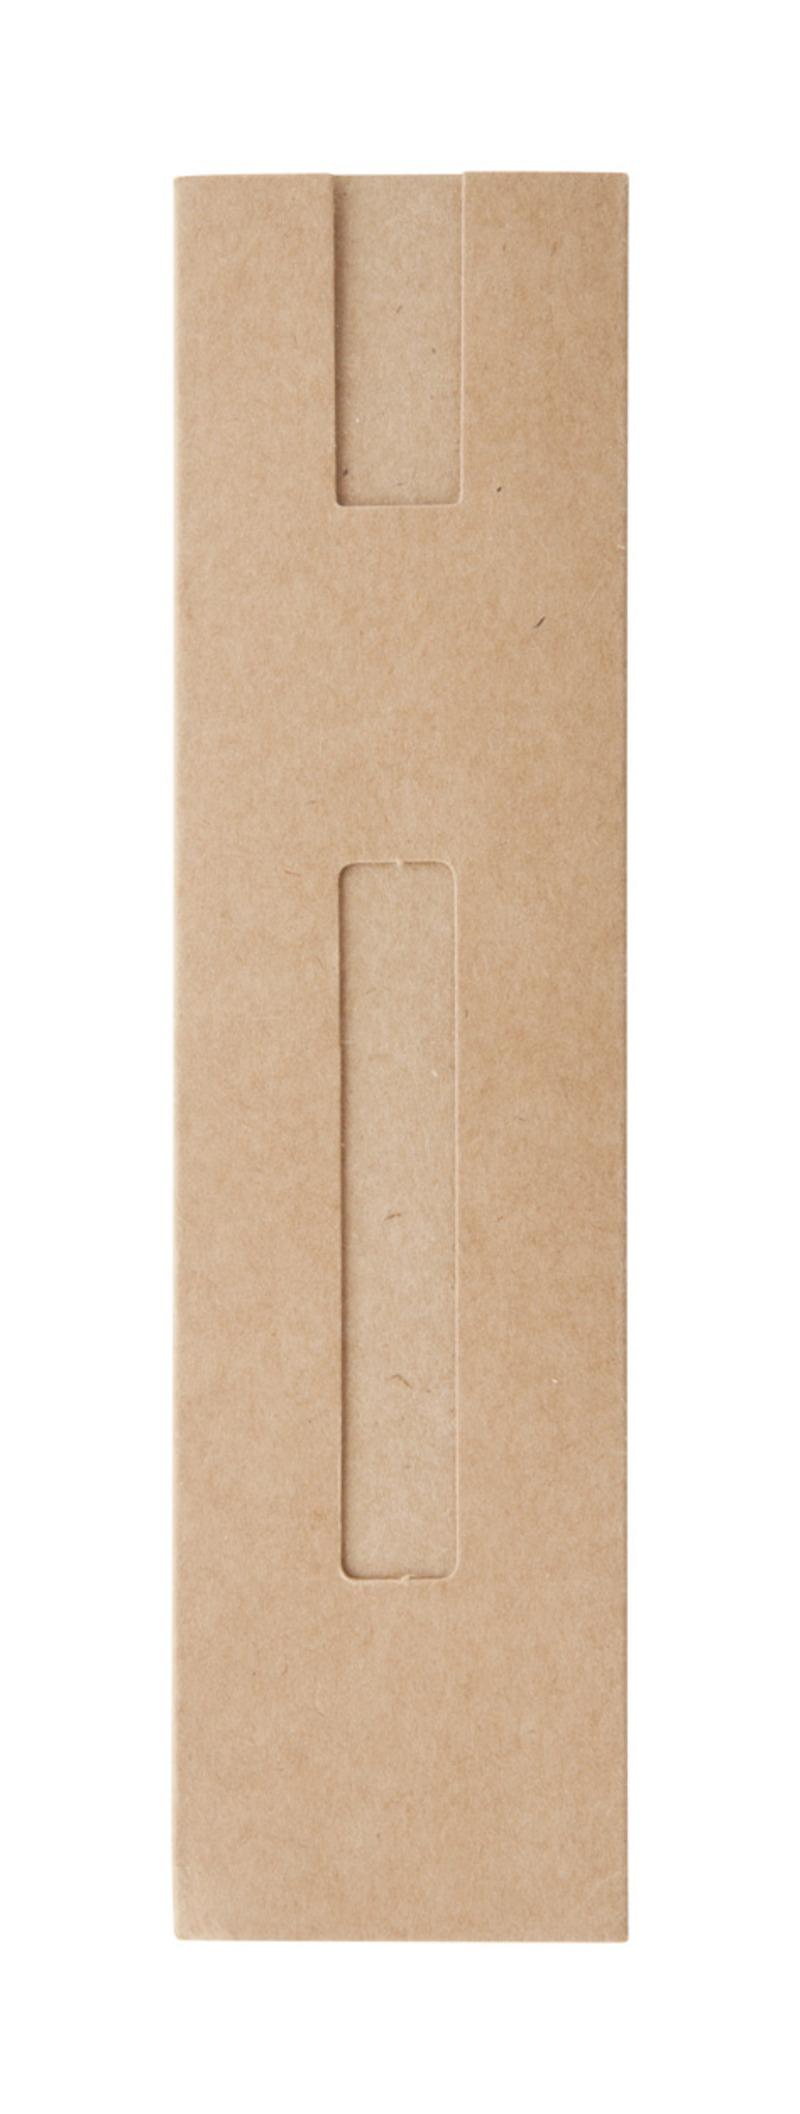 Recycard pen pouch